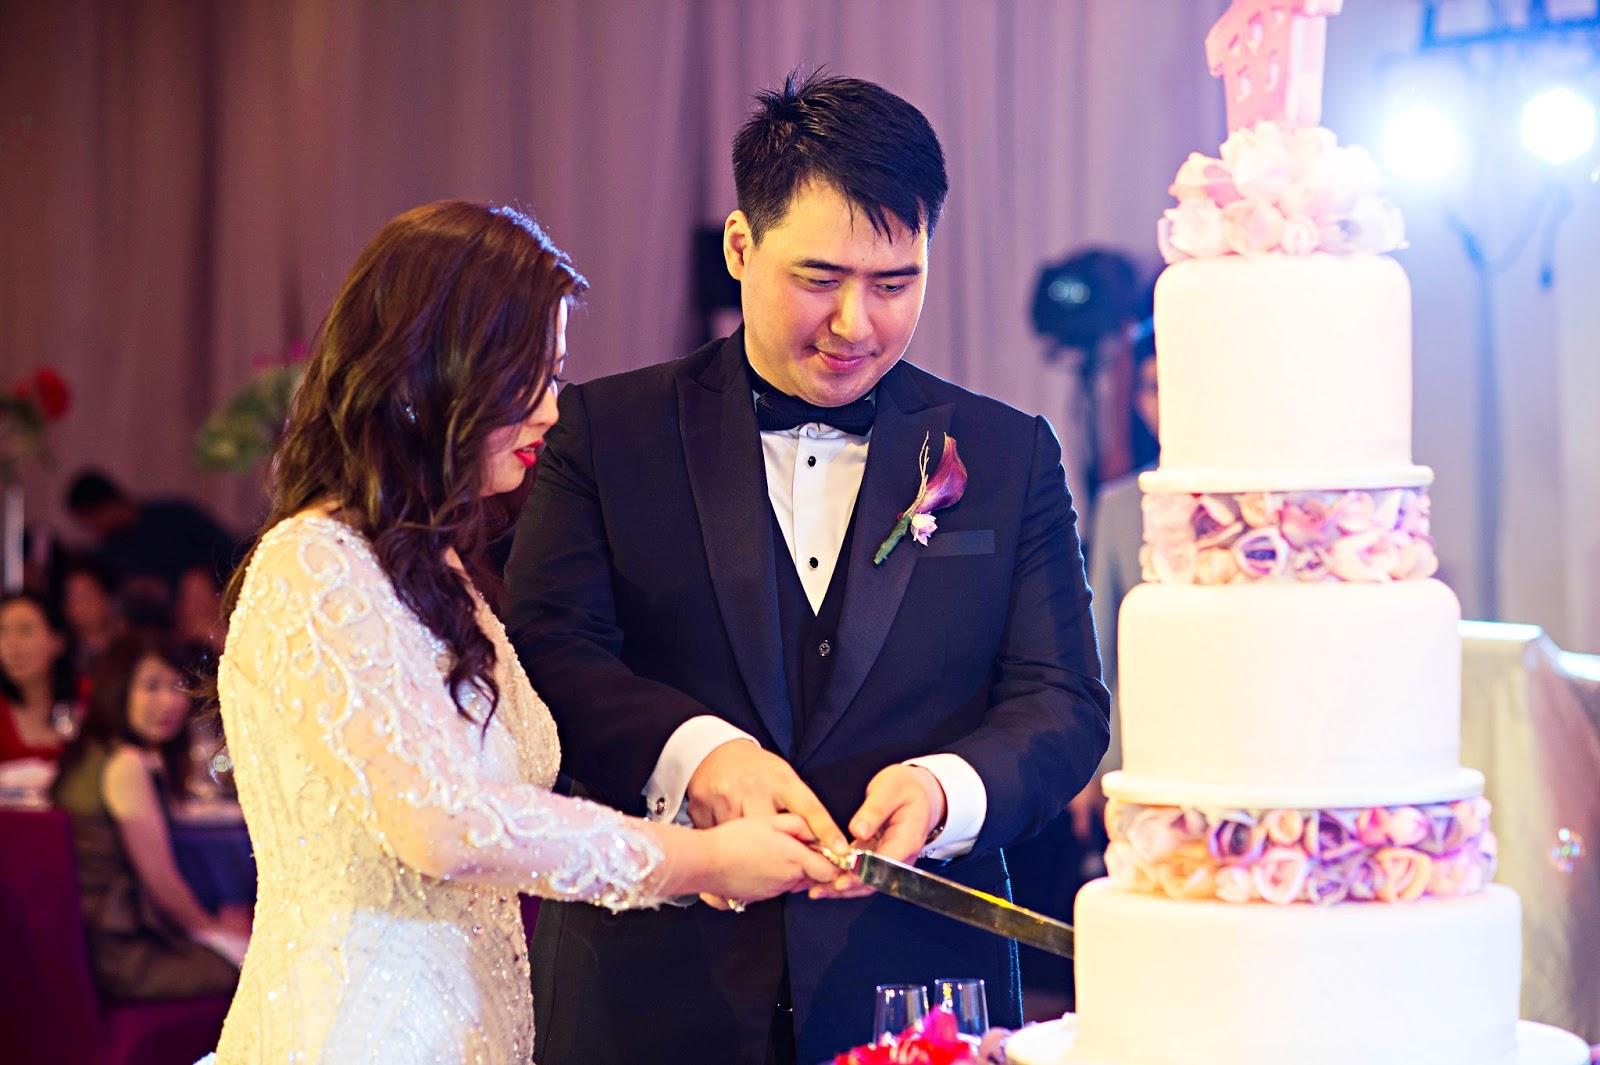 Wedding Cake Cutting Songs 35 Amazing Cake cutting